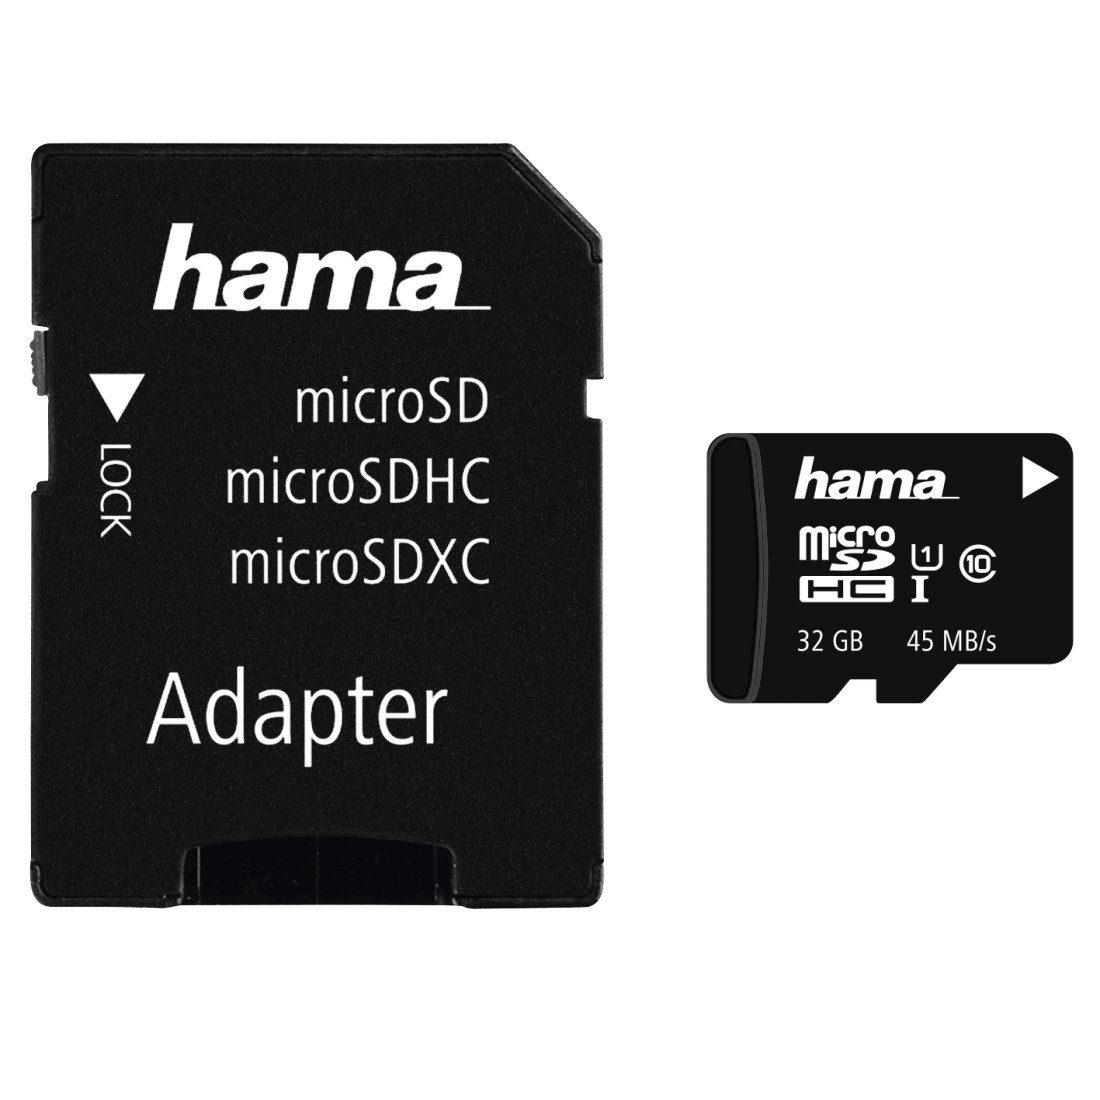 Hama Speicherkarte microSDHC 32 GB, Class 10, UHS-I, 45MB/s »inkl. Adapter/Foto«